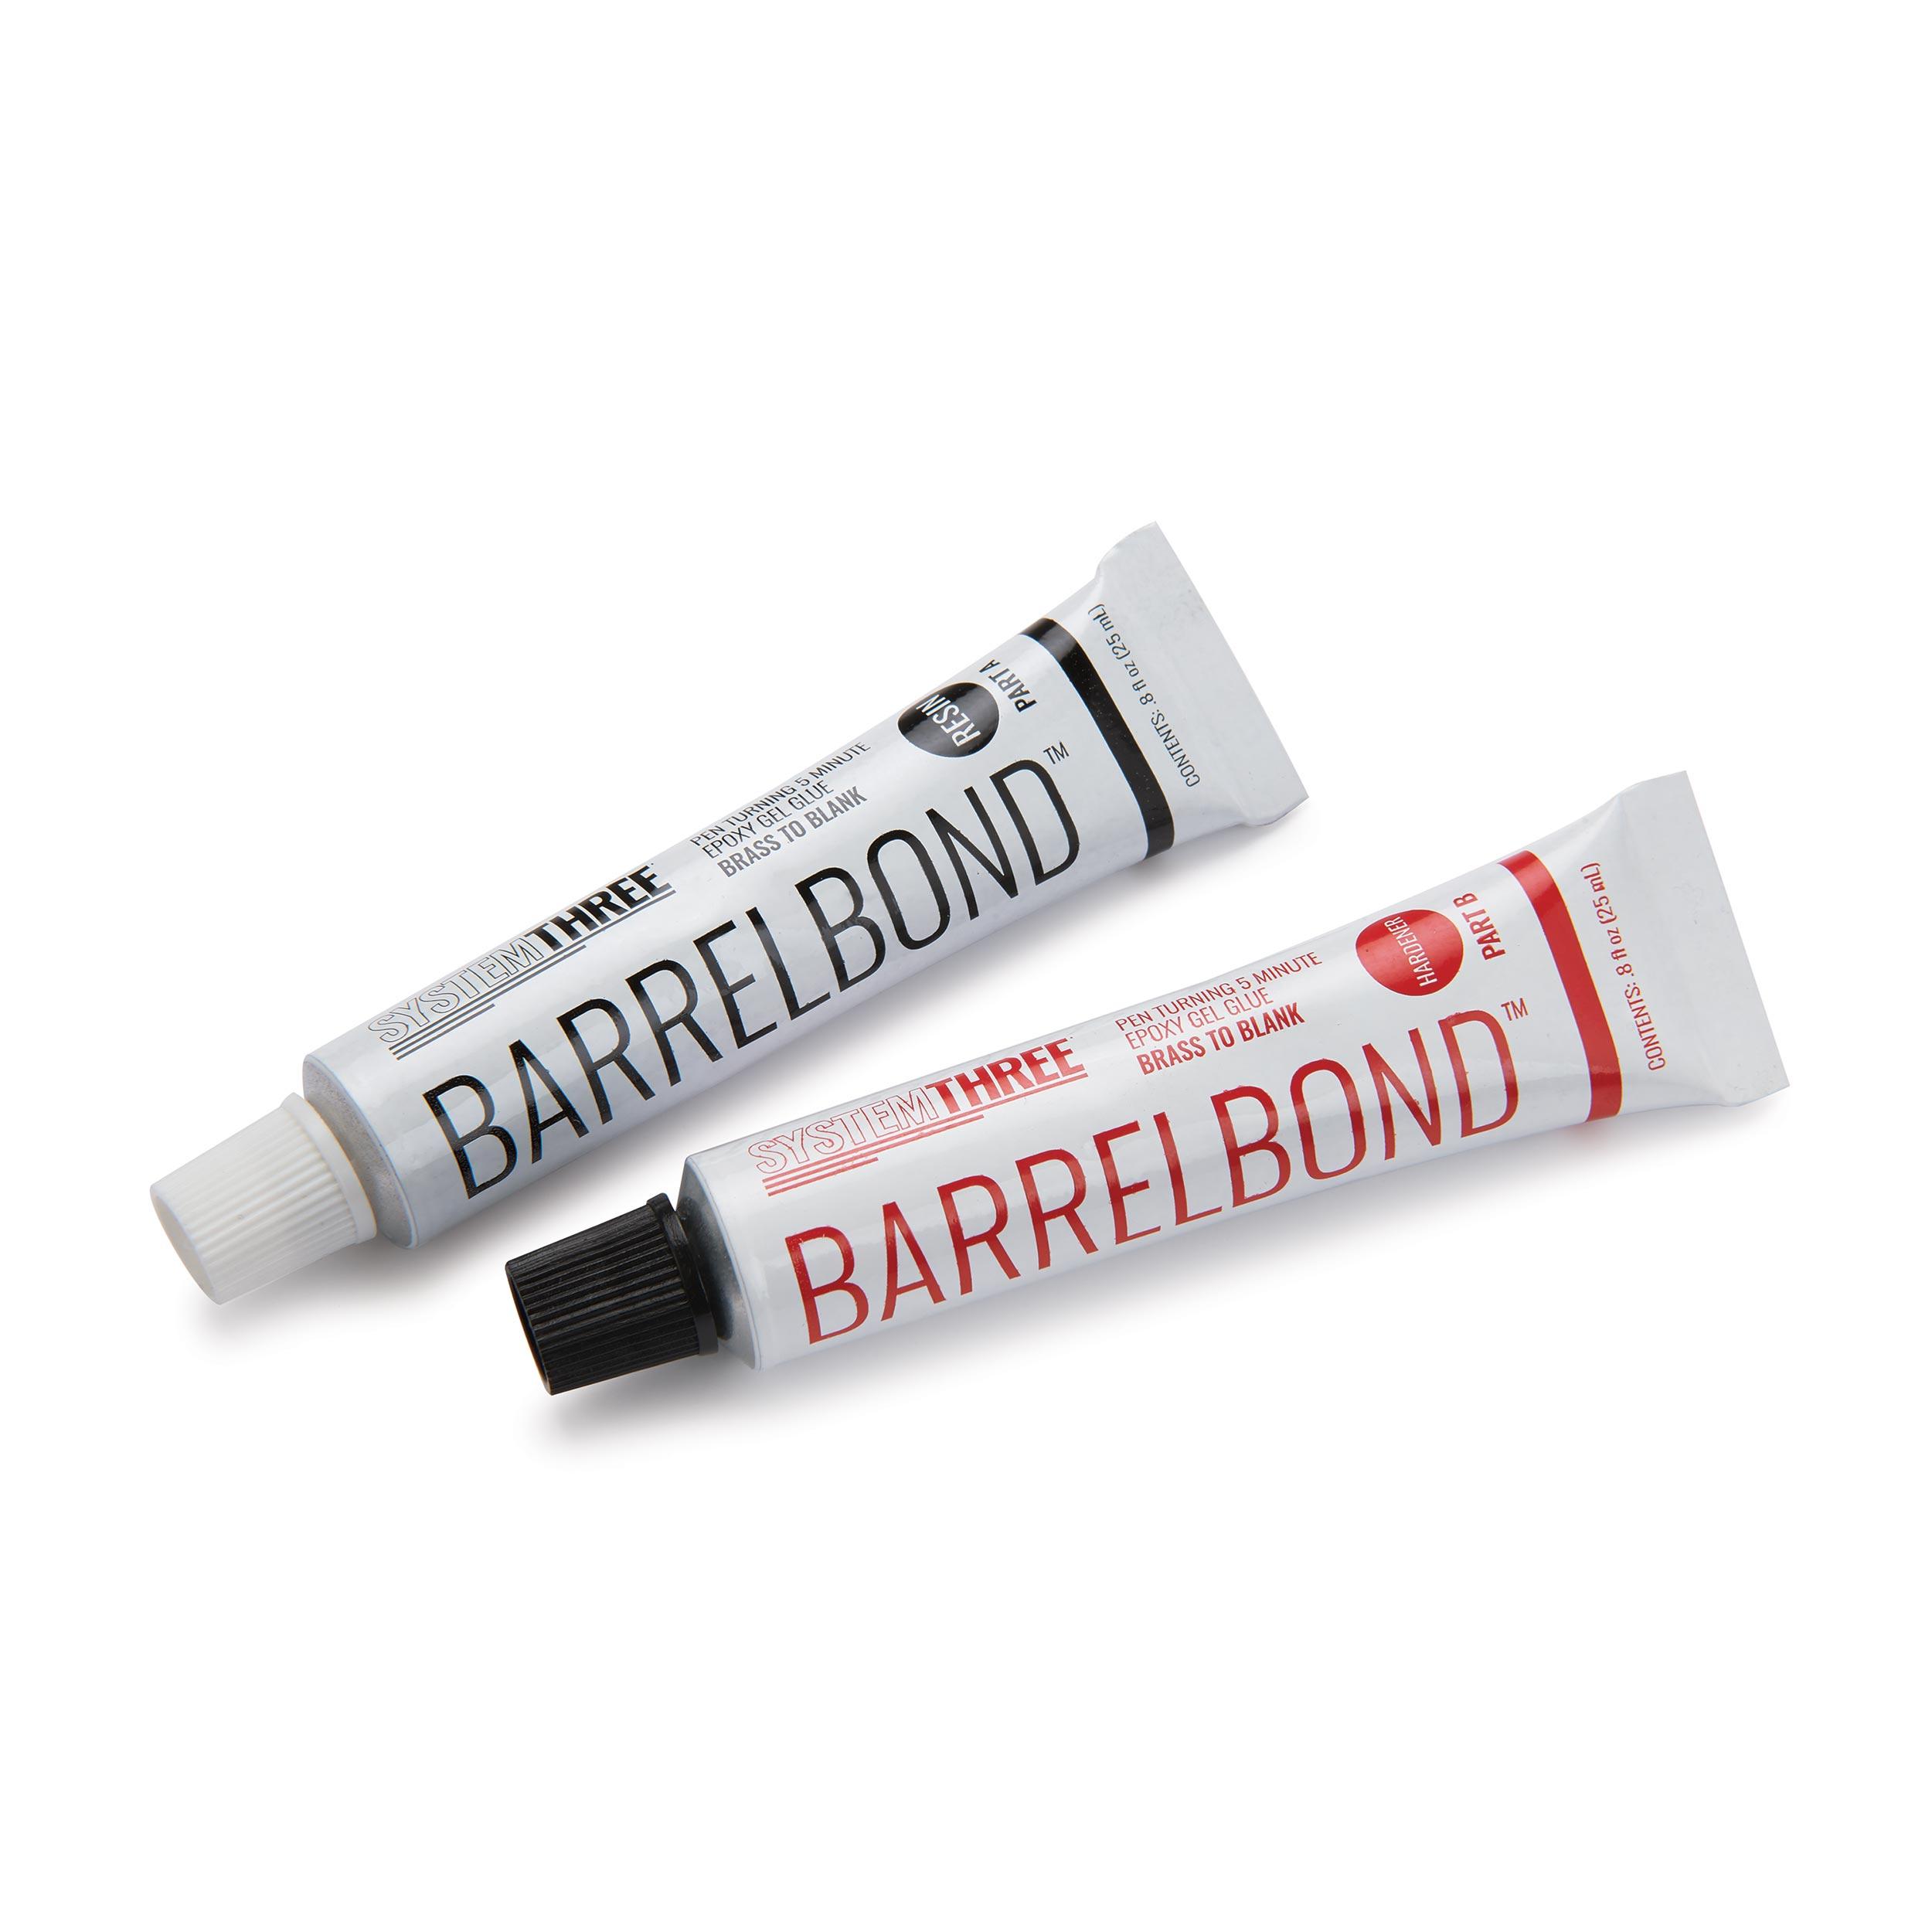 BarrelBond 5 Minute Gel Glue 2-oz